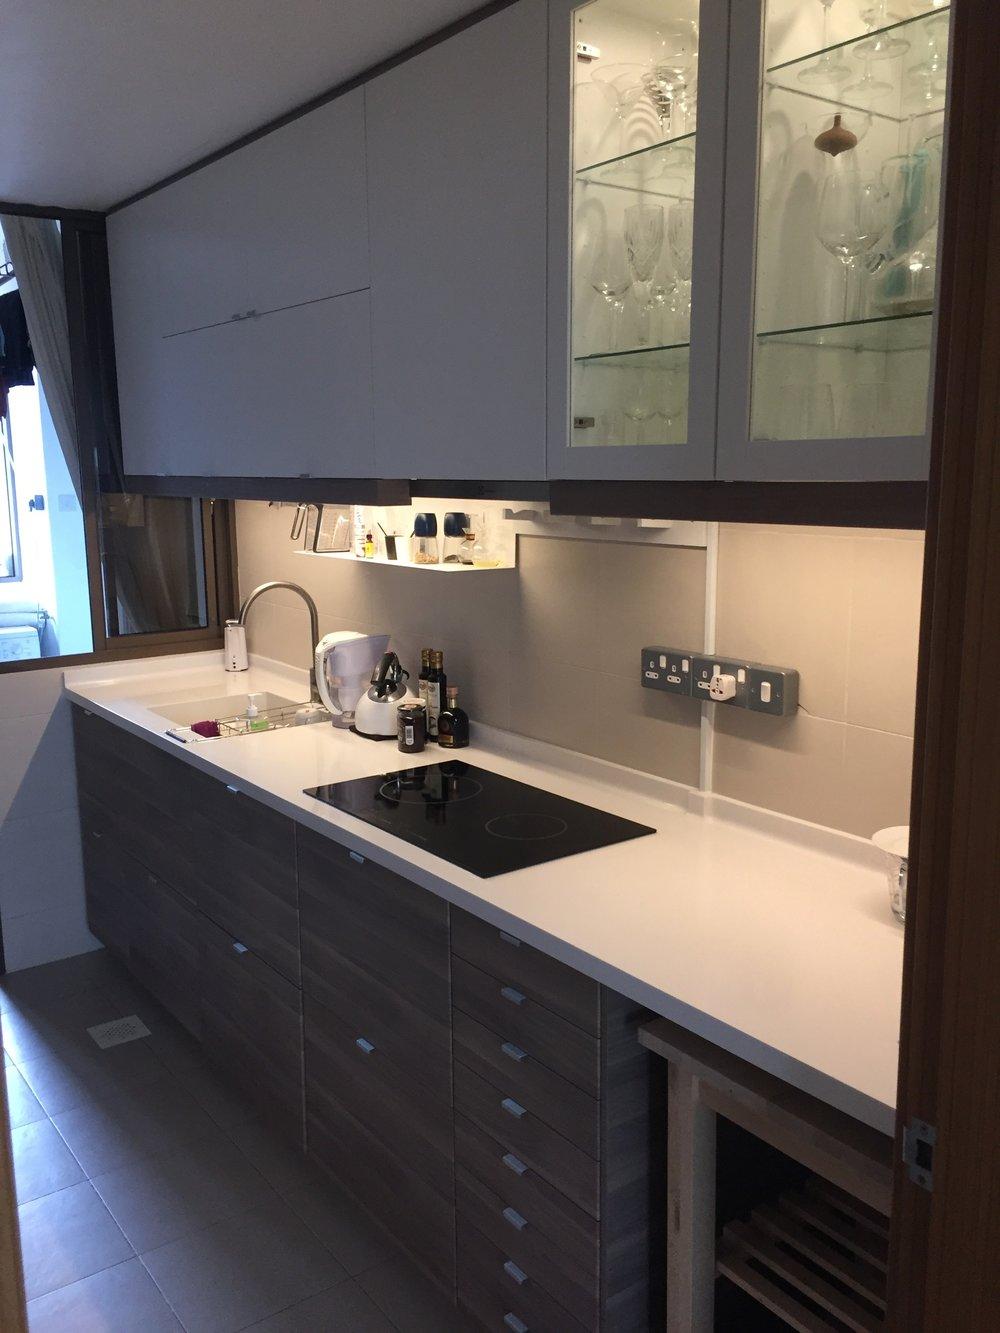 BELMONDOVIEW - 3 +1 Beds, Great kitchen, Balestier AreaS$3,600